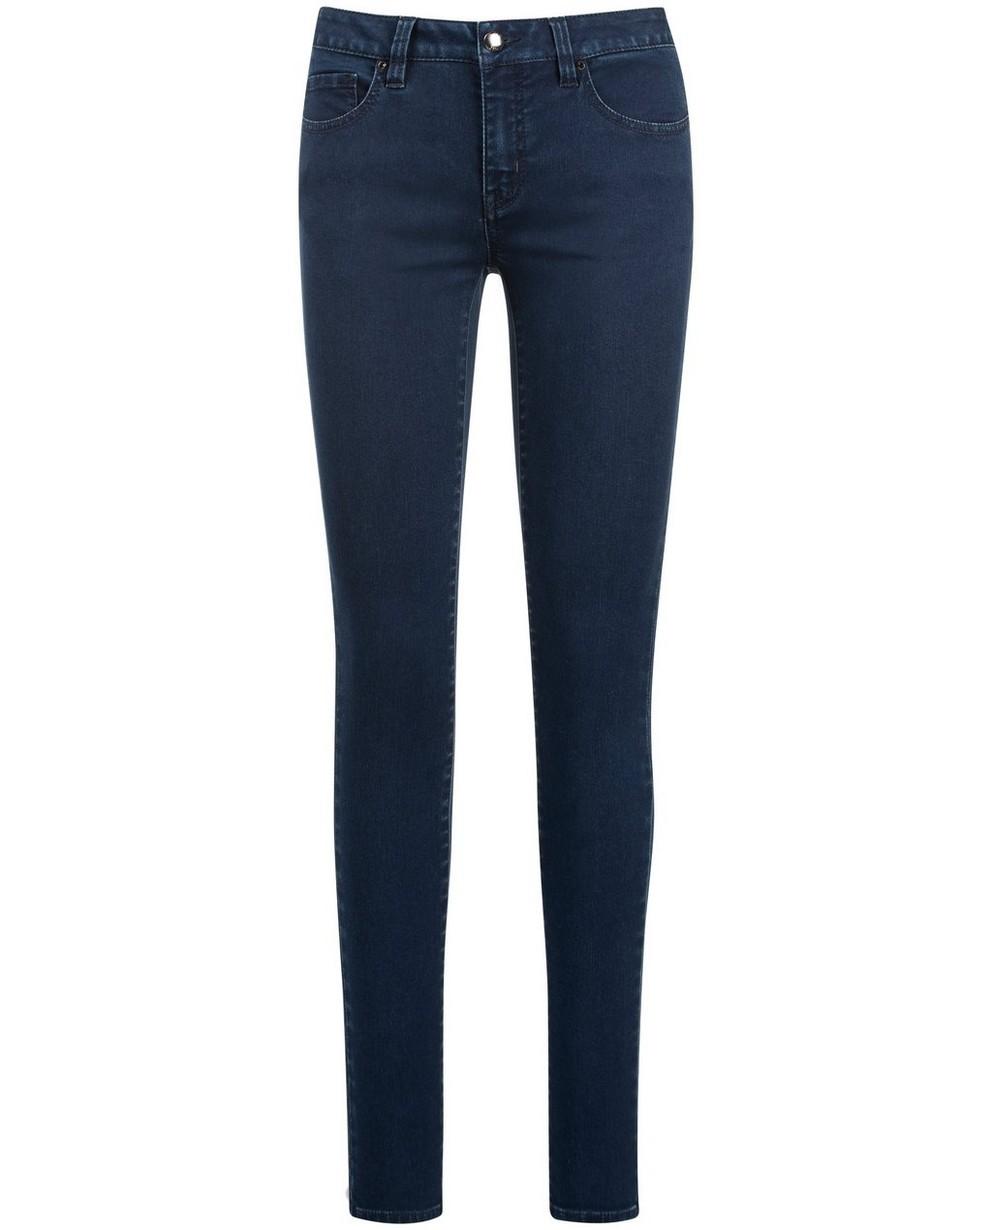 Jeans - aqua - Donkerblauwe skinny jeans